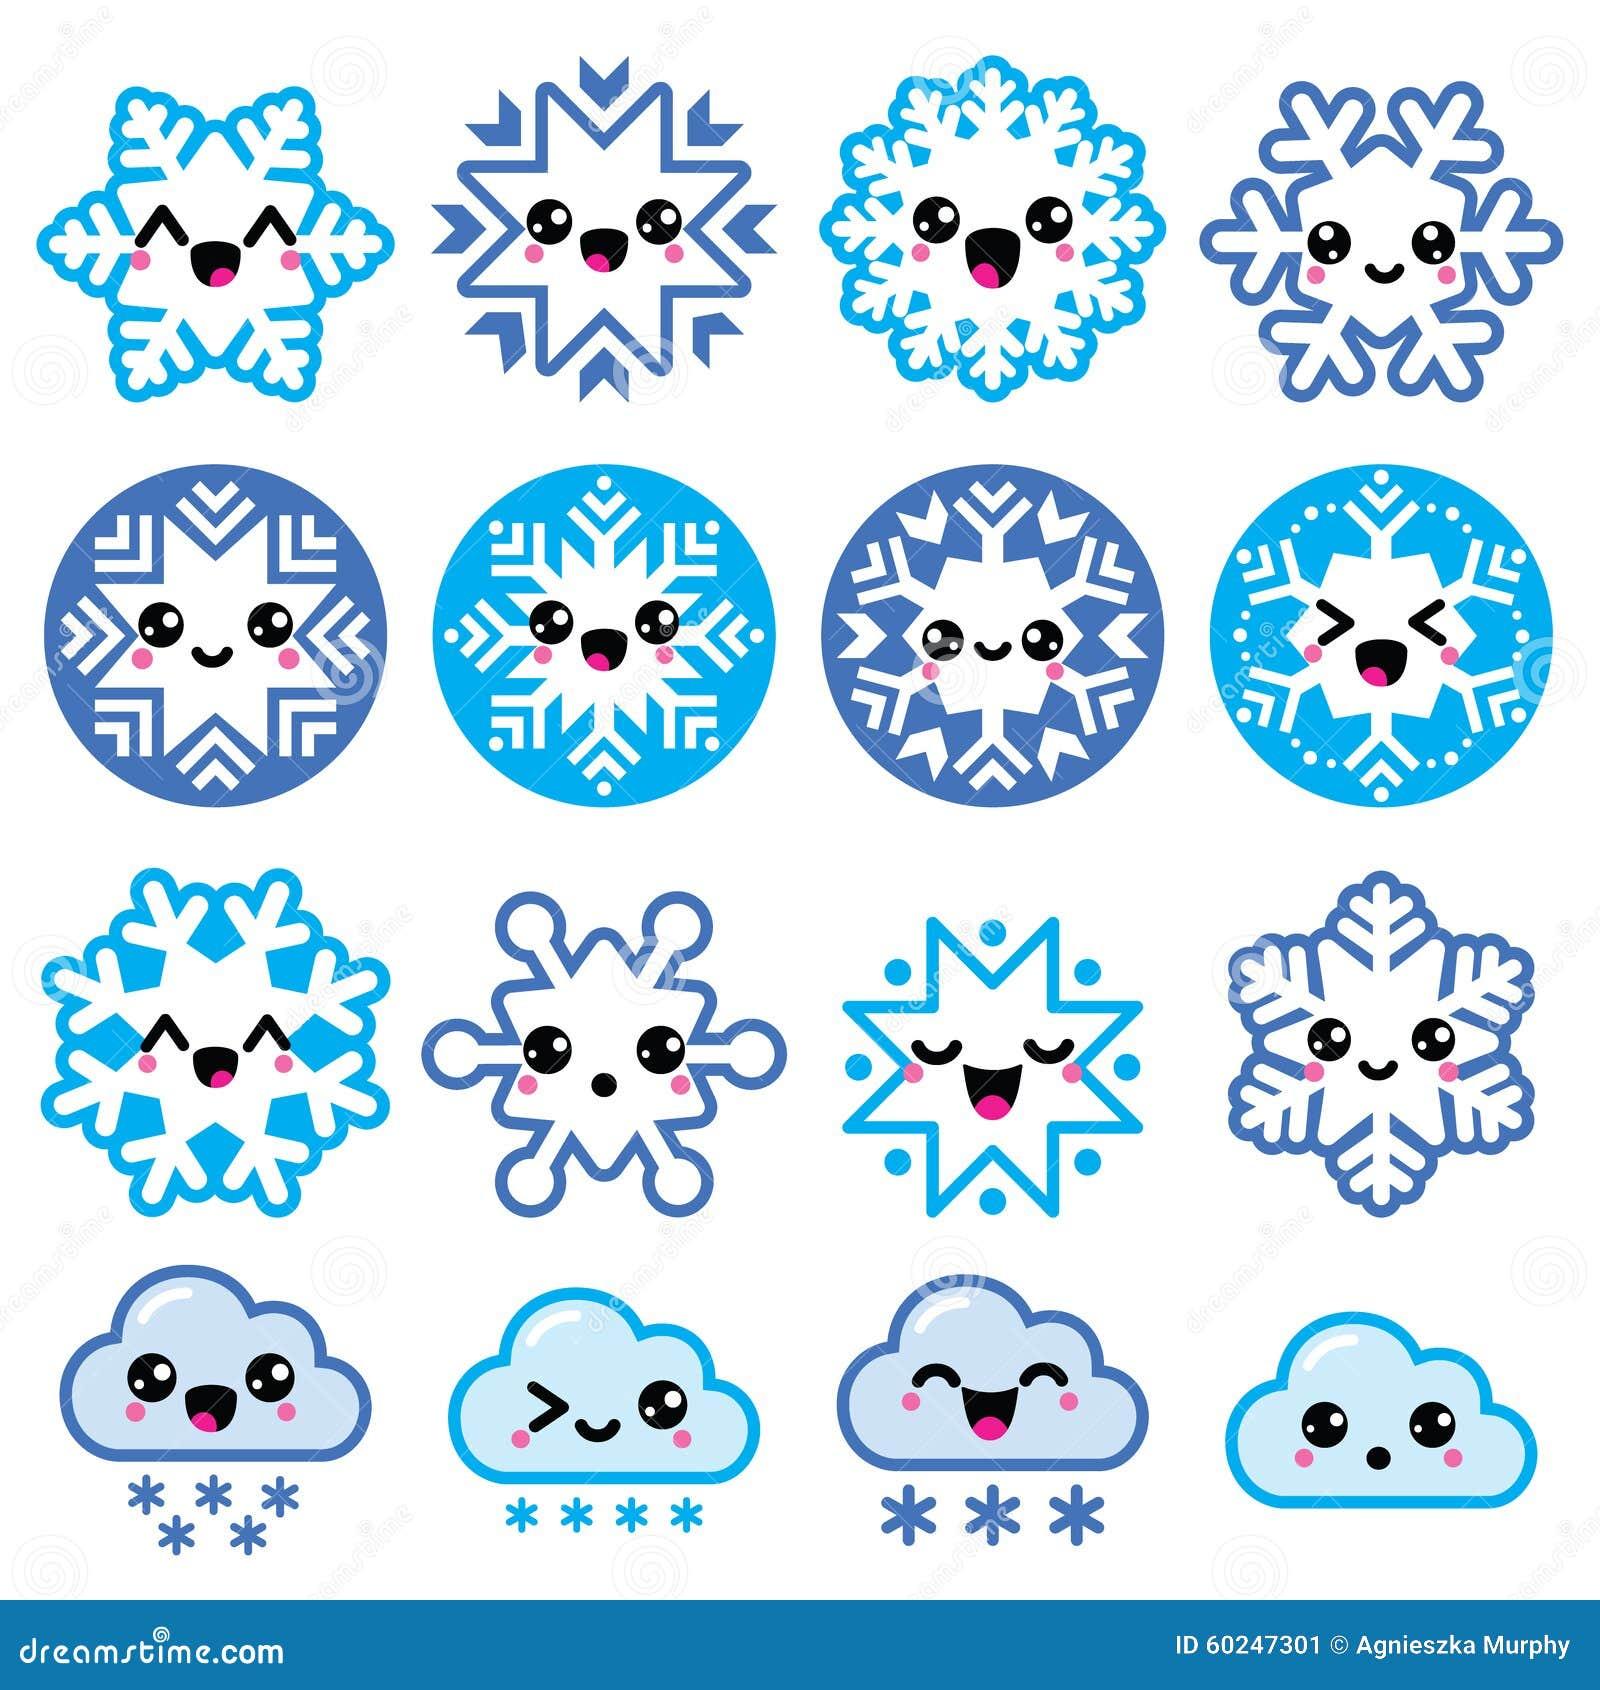 kawaii snowflakes  clouds with snow christmas  winter Snowman Emoji Santa Claus Emoticon